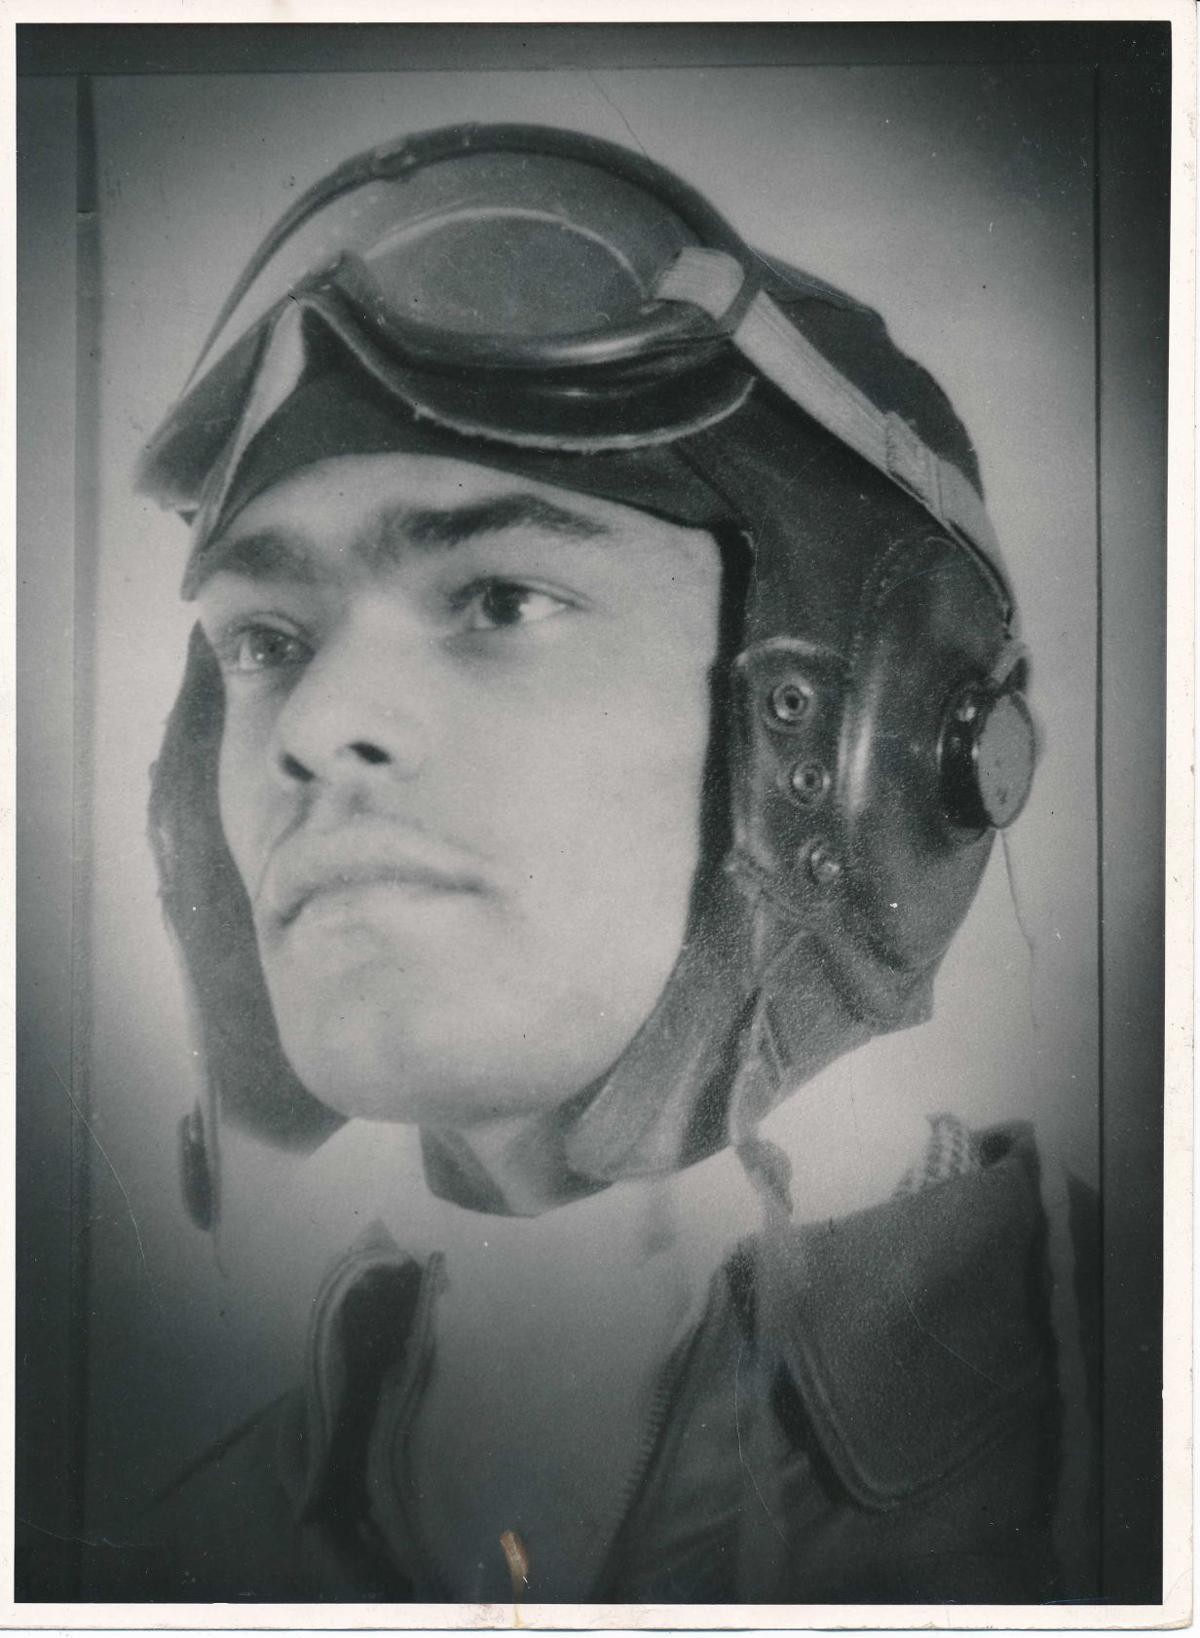 Frank Macon, pilot portrait, Tuskeegee